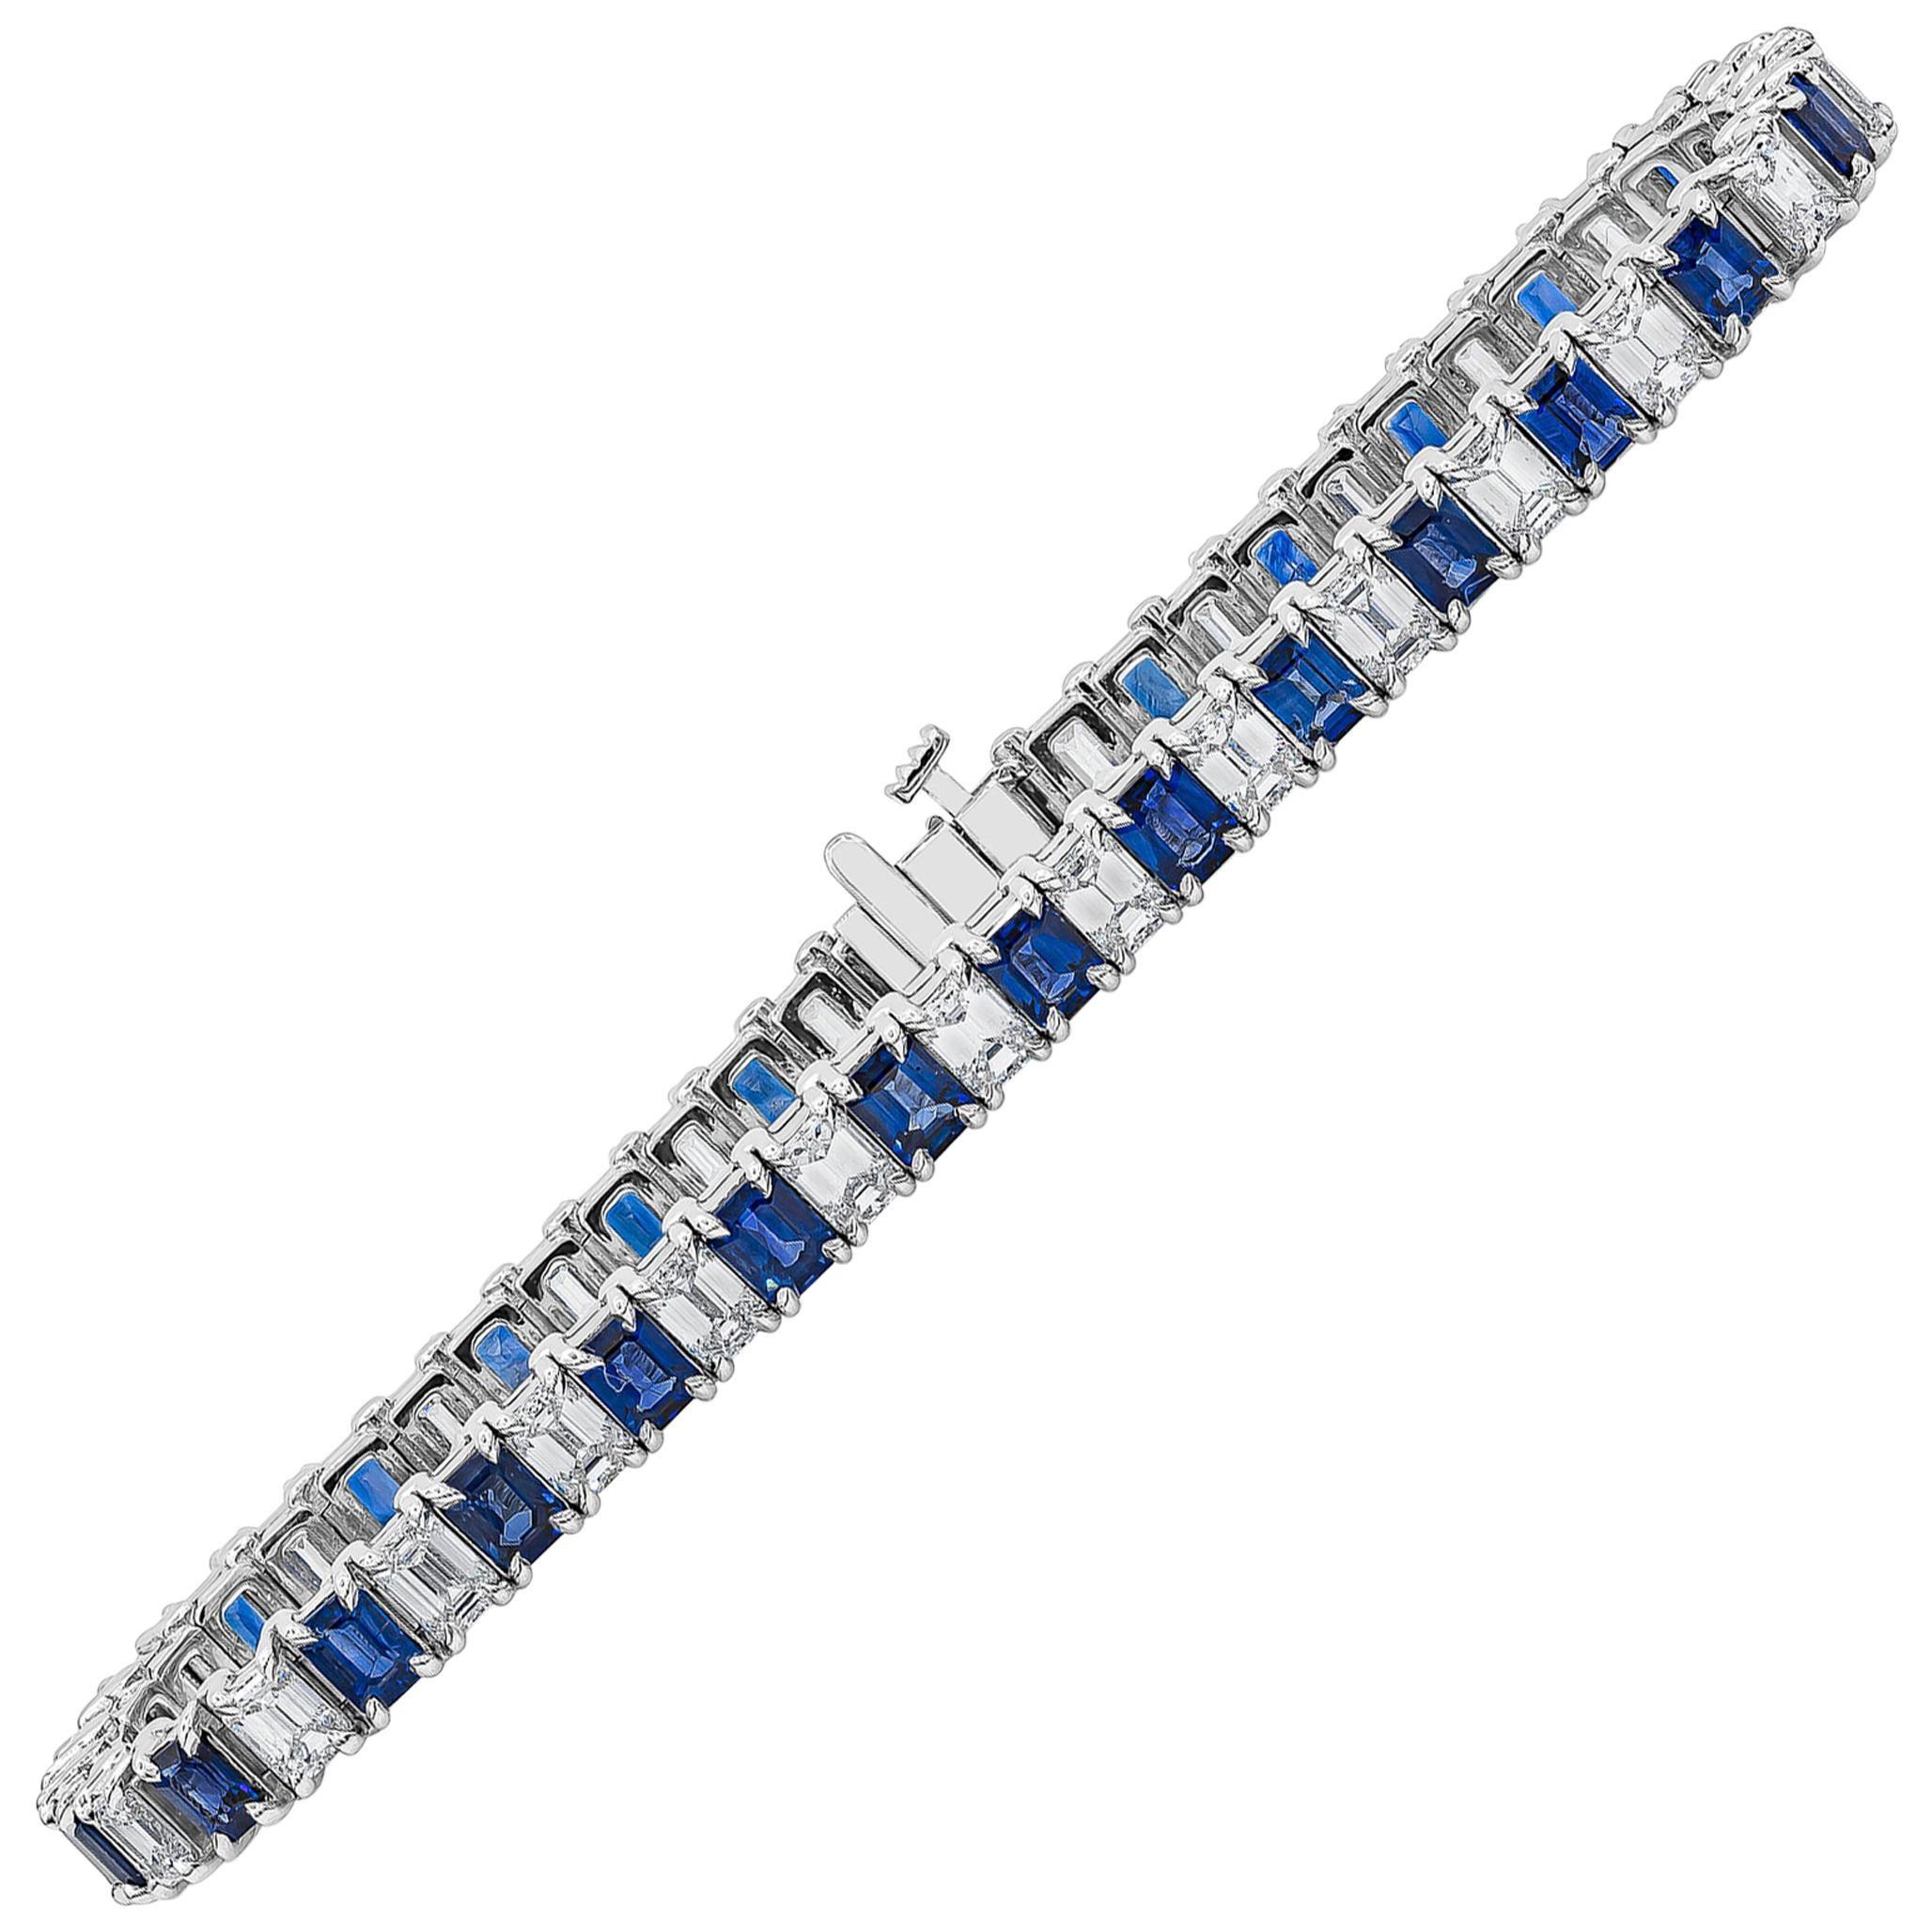 Alternating Emerald Cut Blue Sapphire and Diamond Tennis Bracelet